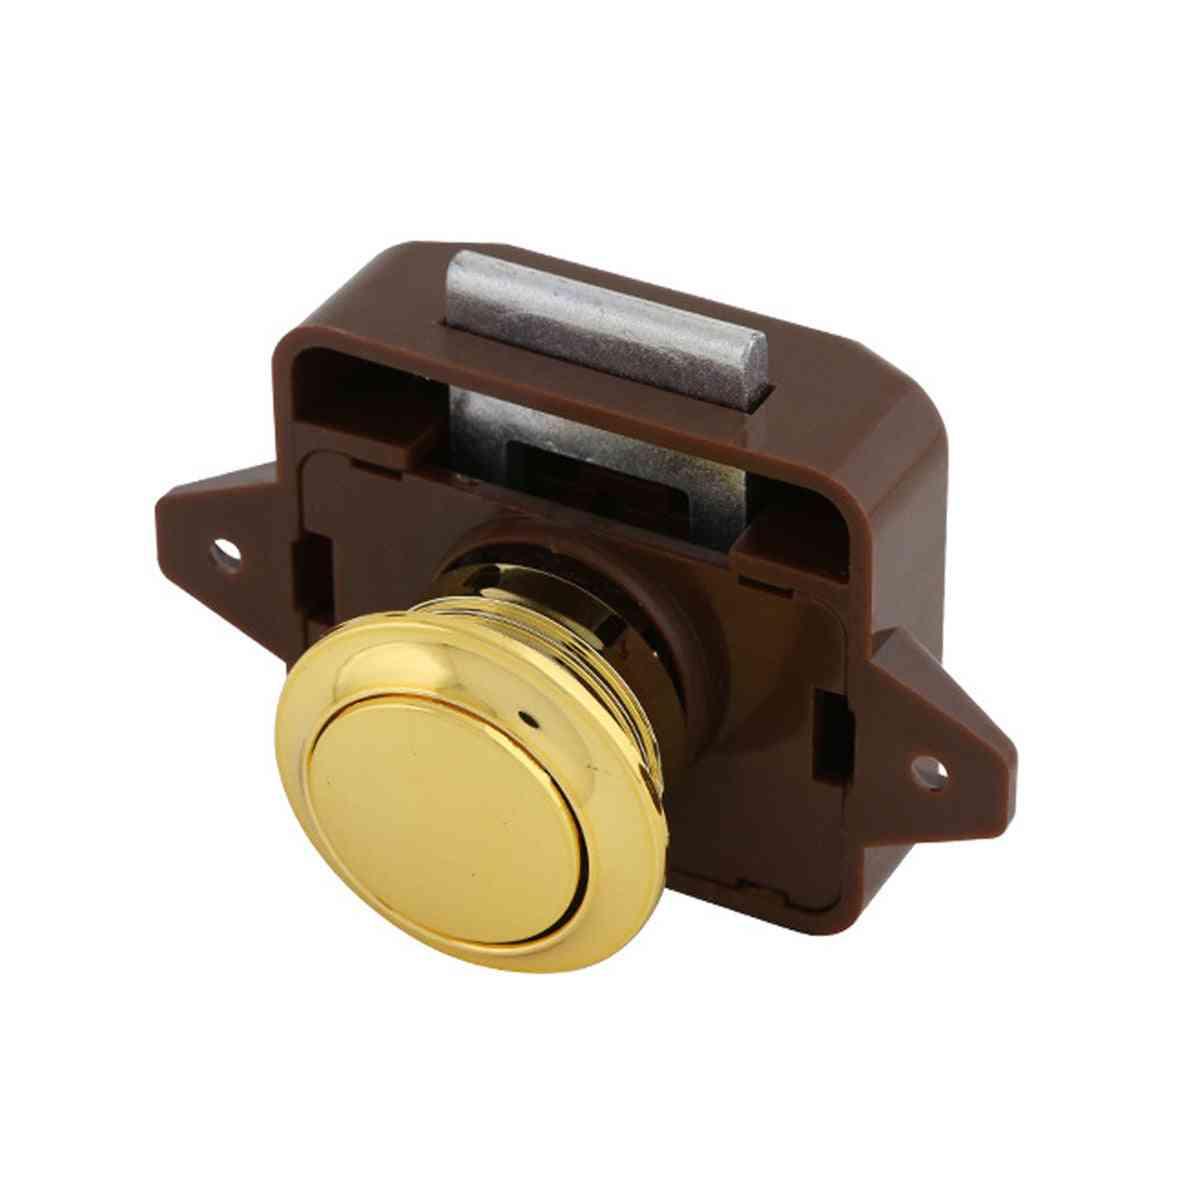 Keyless Push Button Spring Latch  For Rv Yacht Drawer Boat